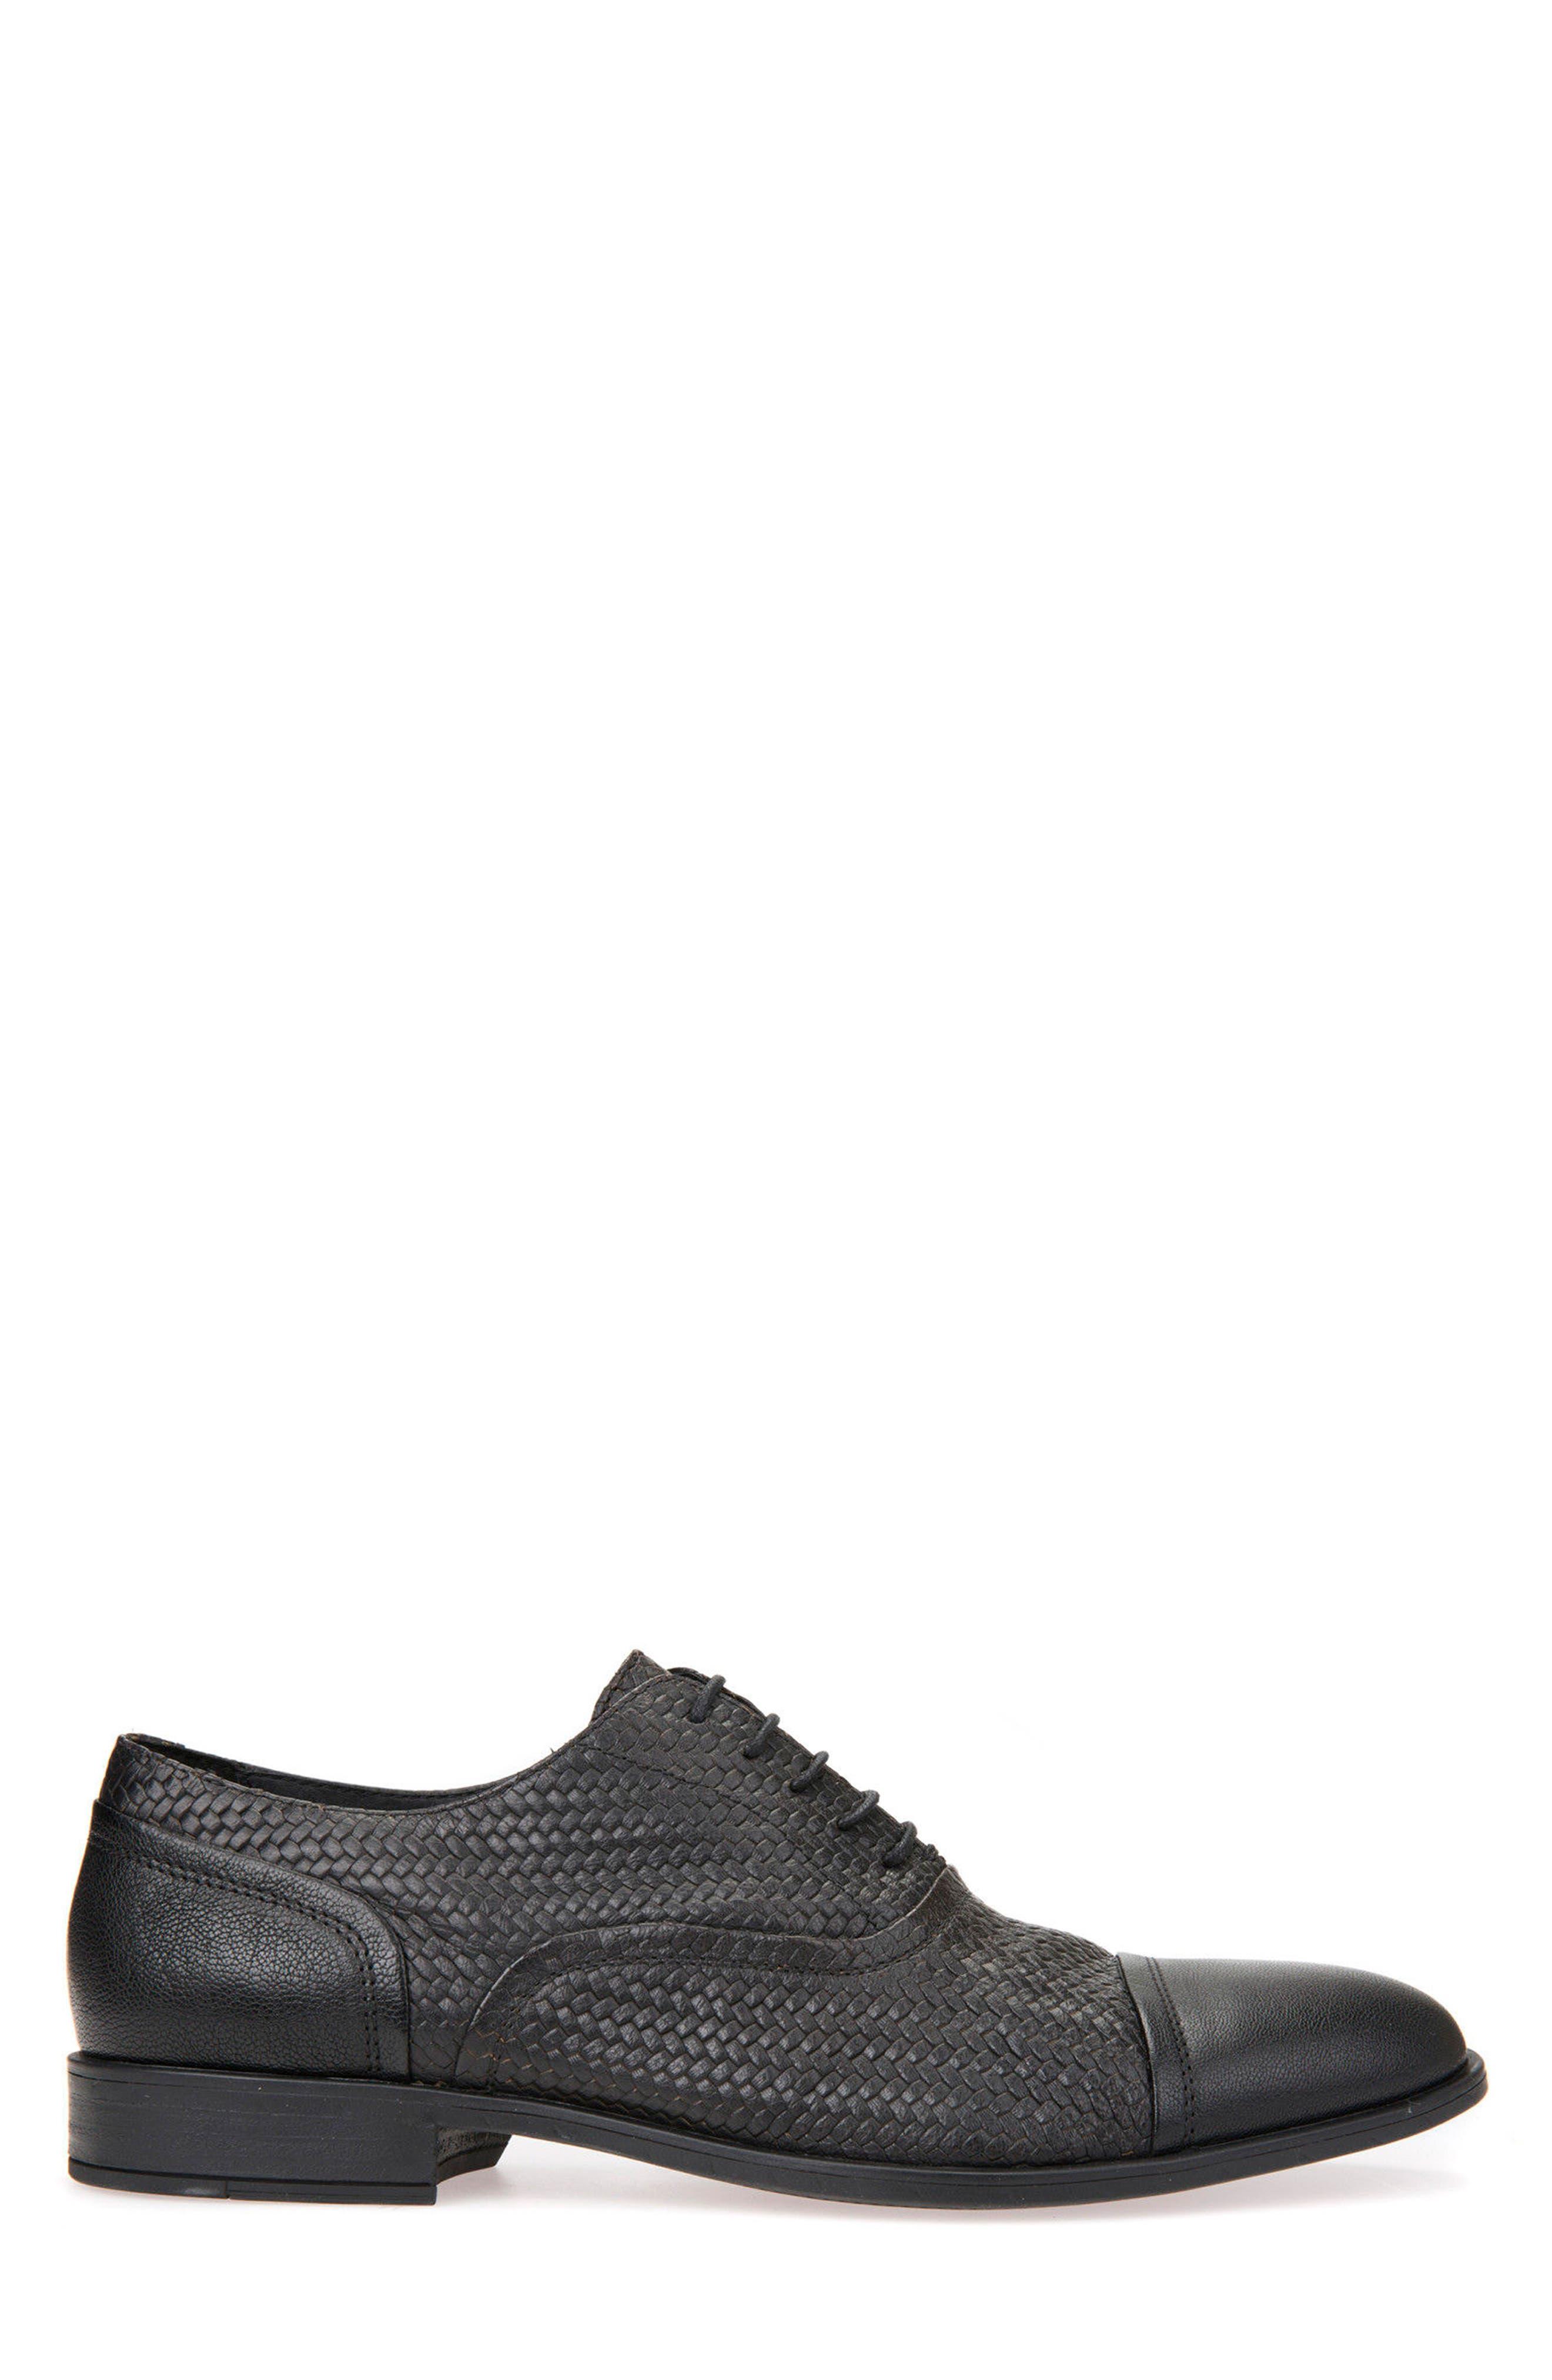 Bryceton Textured Cap Toe Oxford,                             Alternate thumbnail 3, color,                             BLACK LEATHER